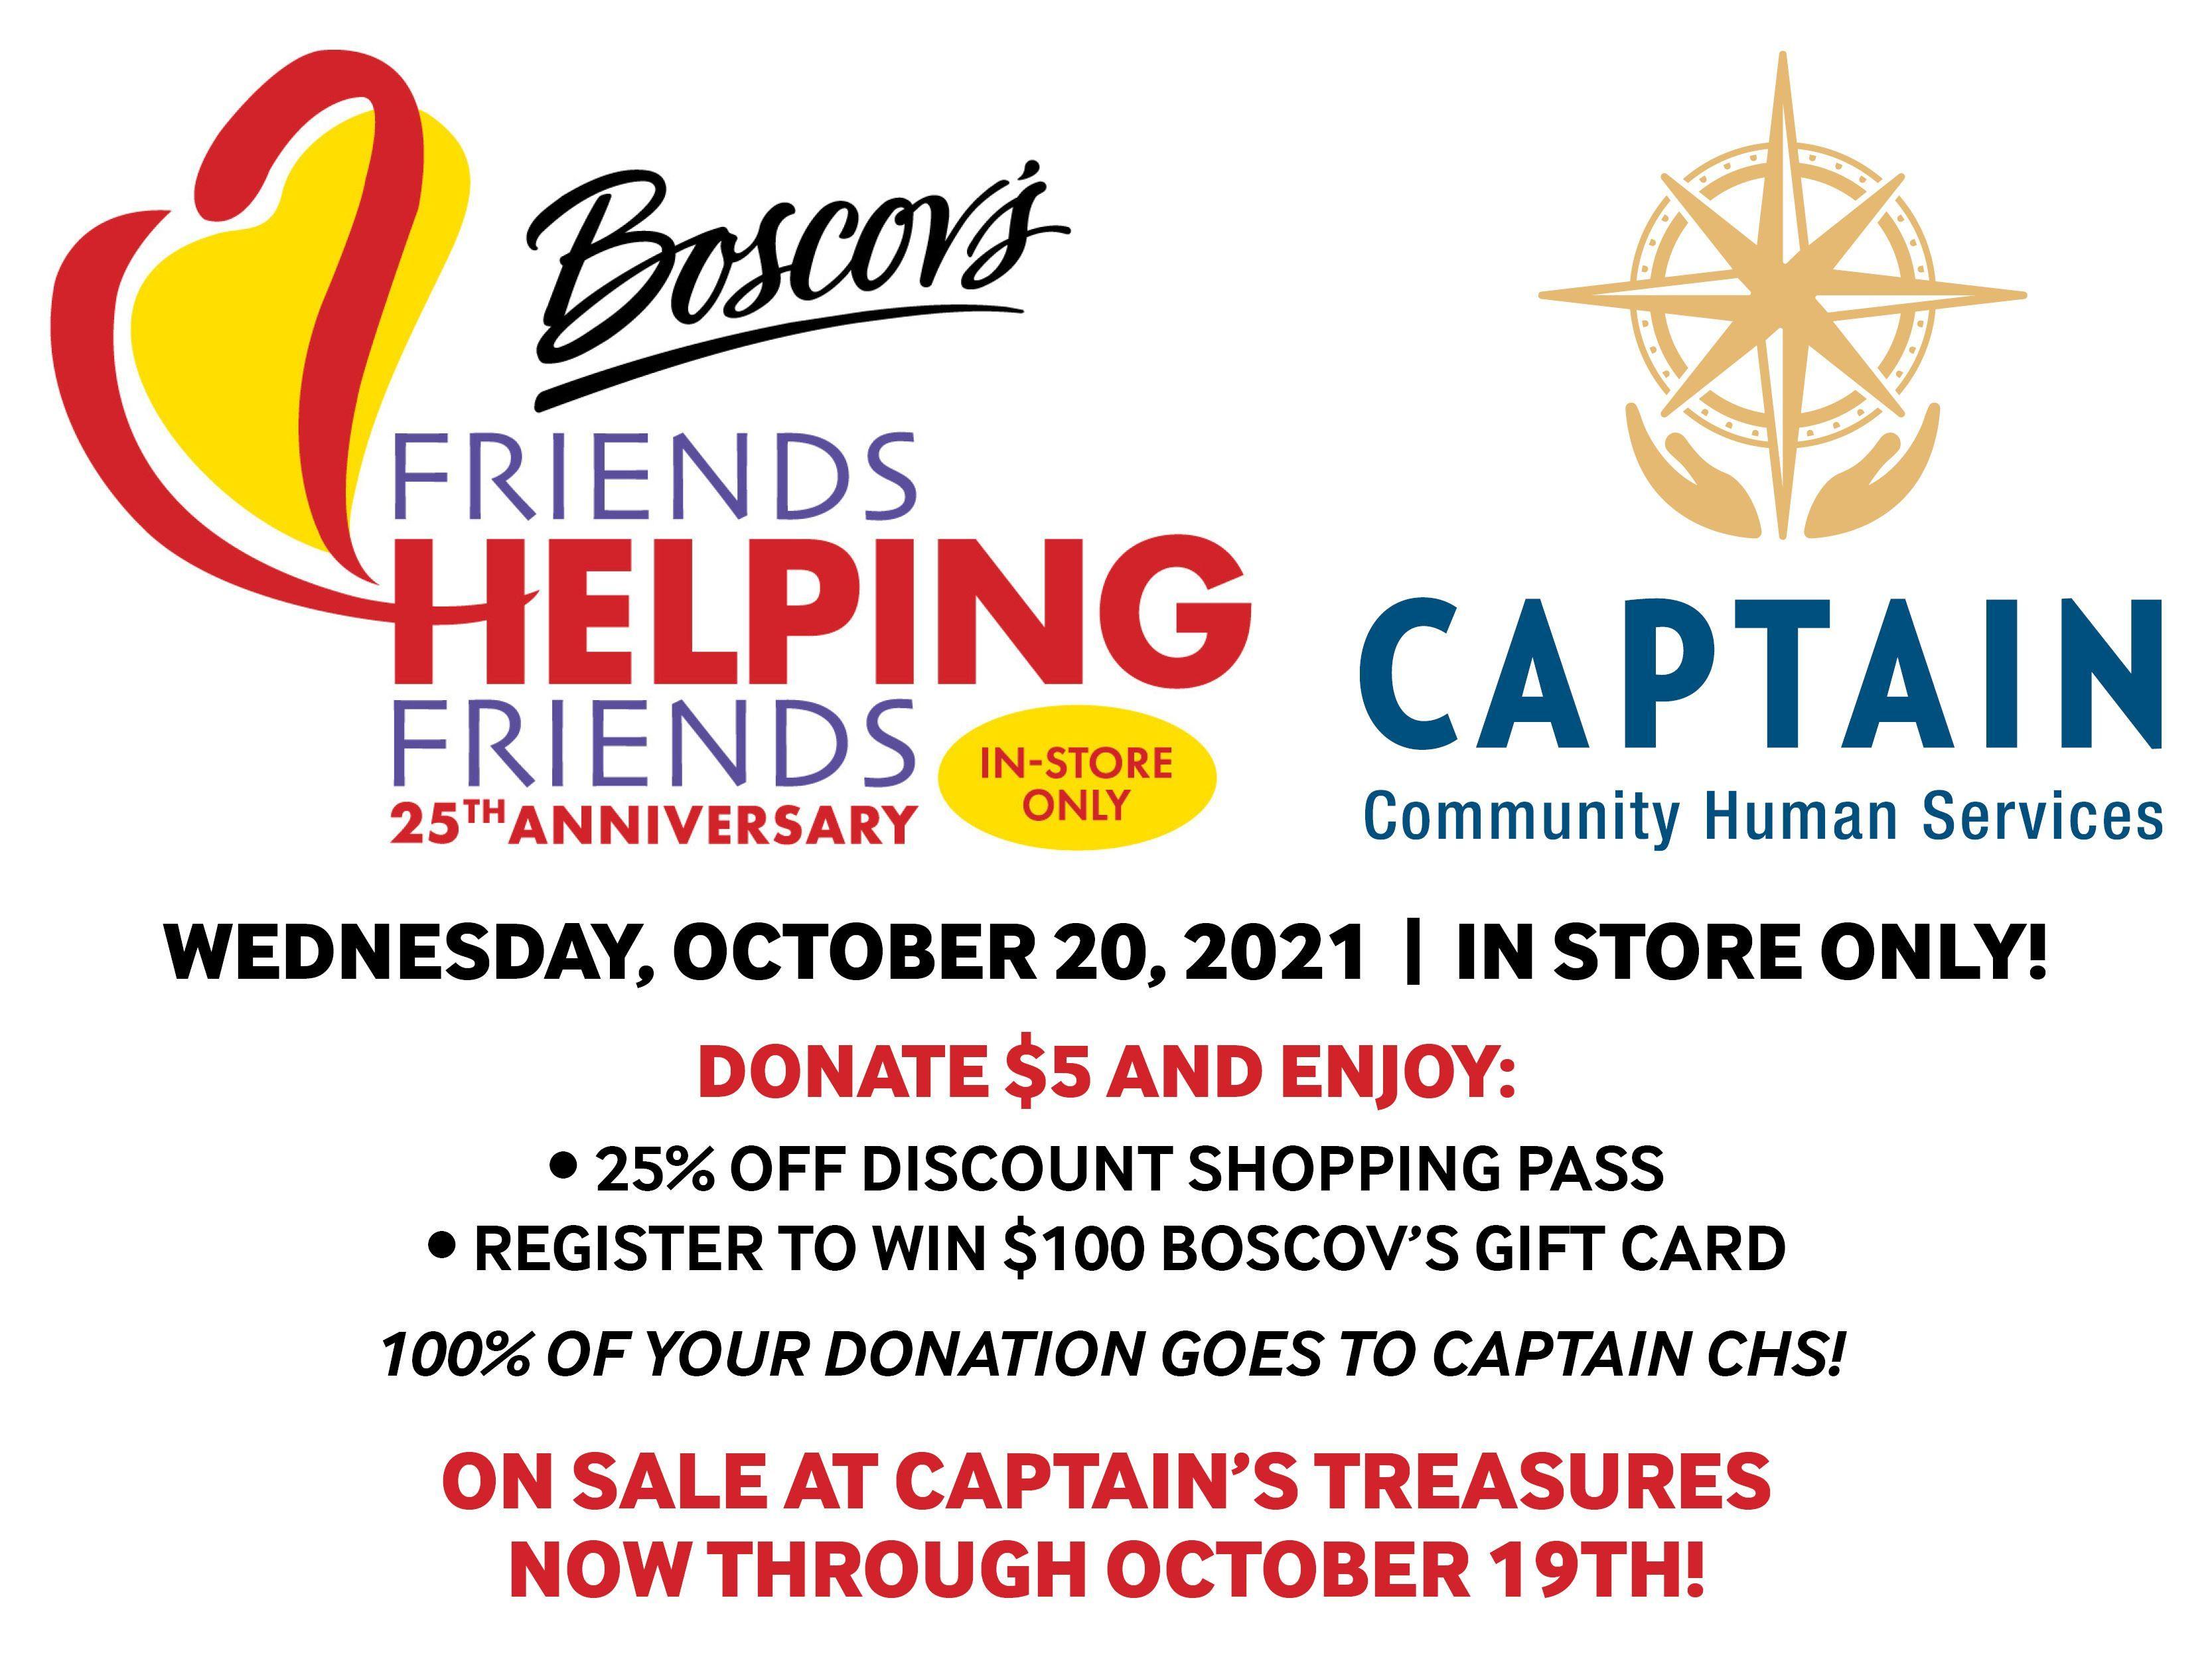 Boscov's Friends Helping Friends 25th Anniversary!